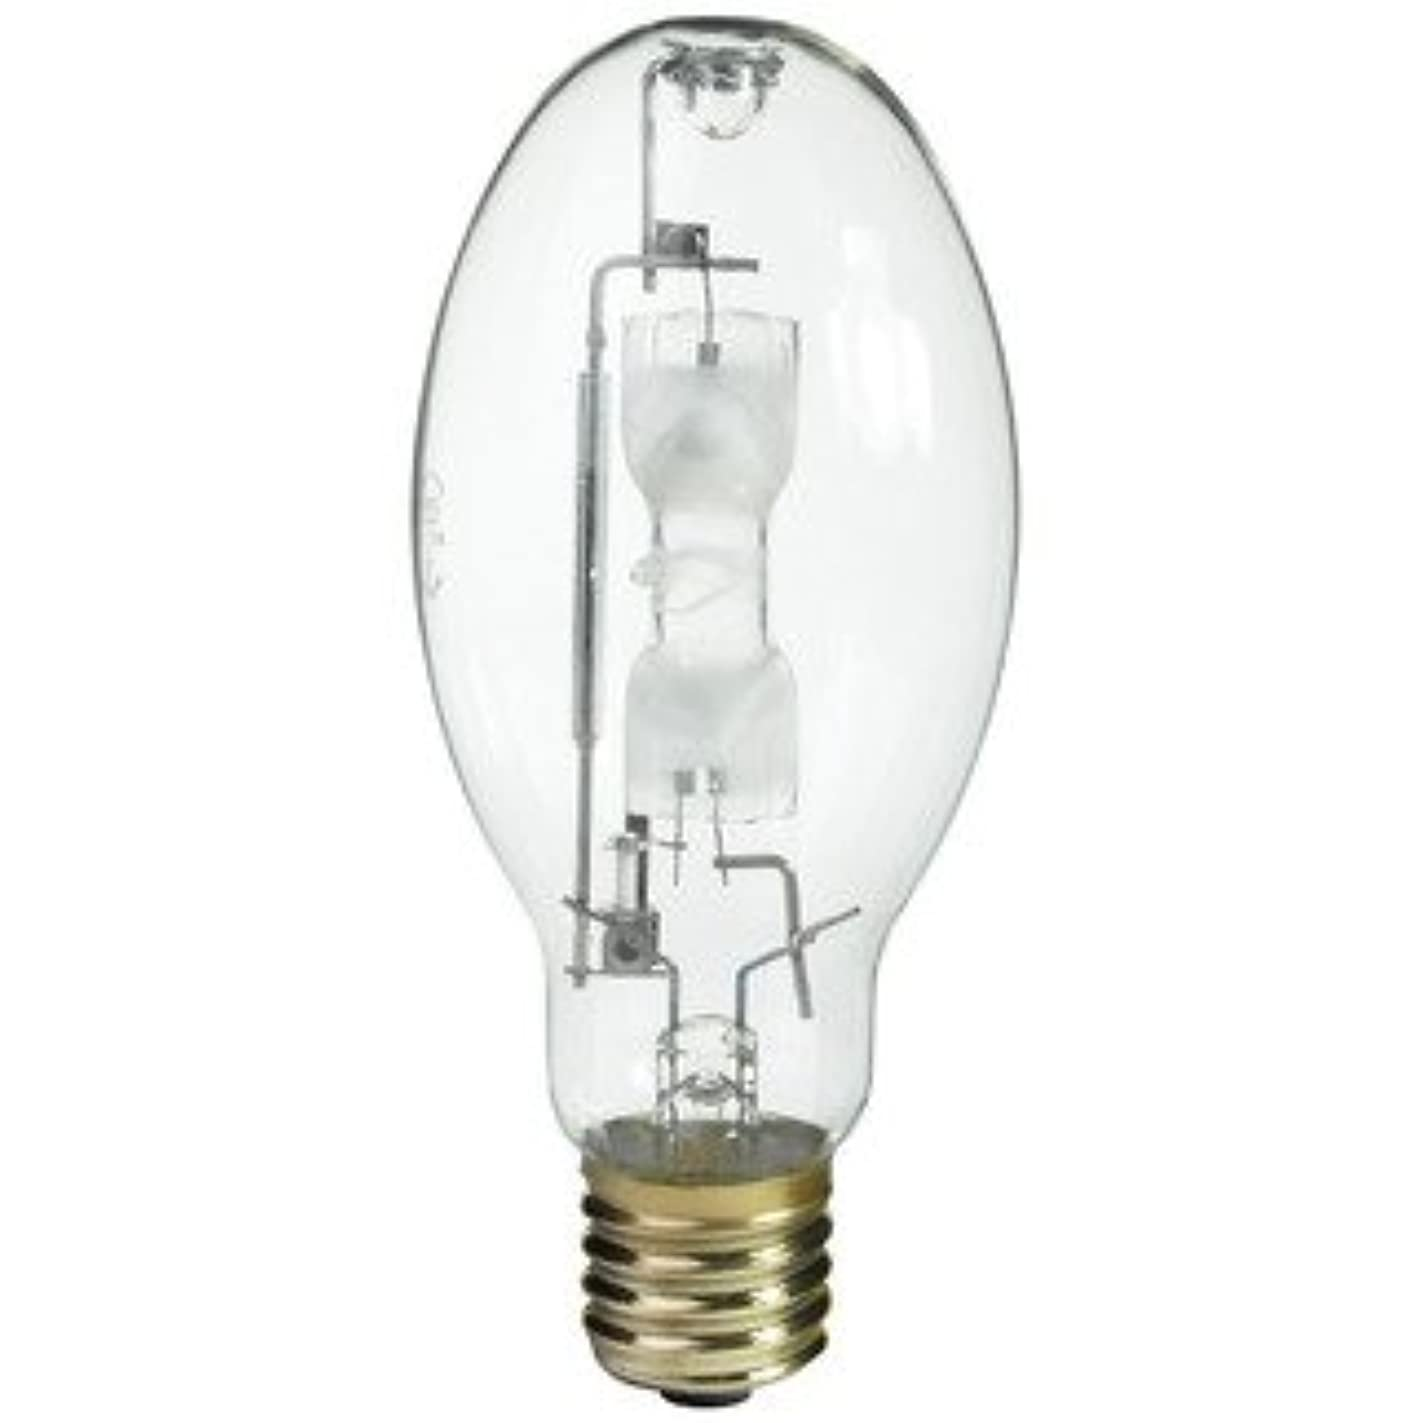 GE 43828 400W Multi-Vapor MVR400/U M59/S R400 HID Metal Halide Light Bulb 2/PACK